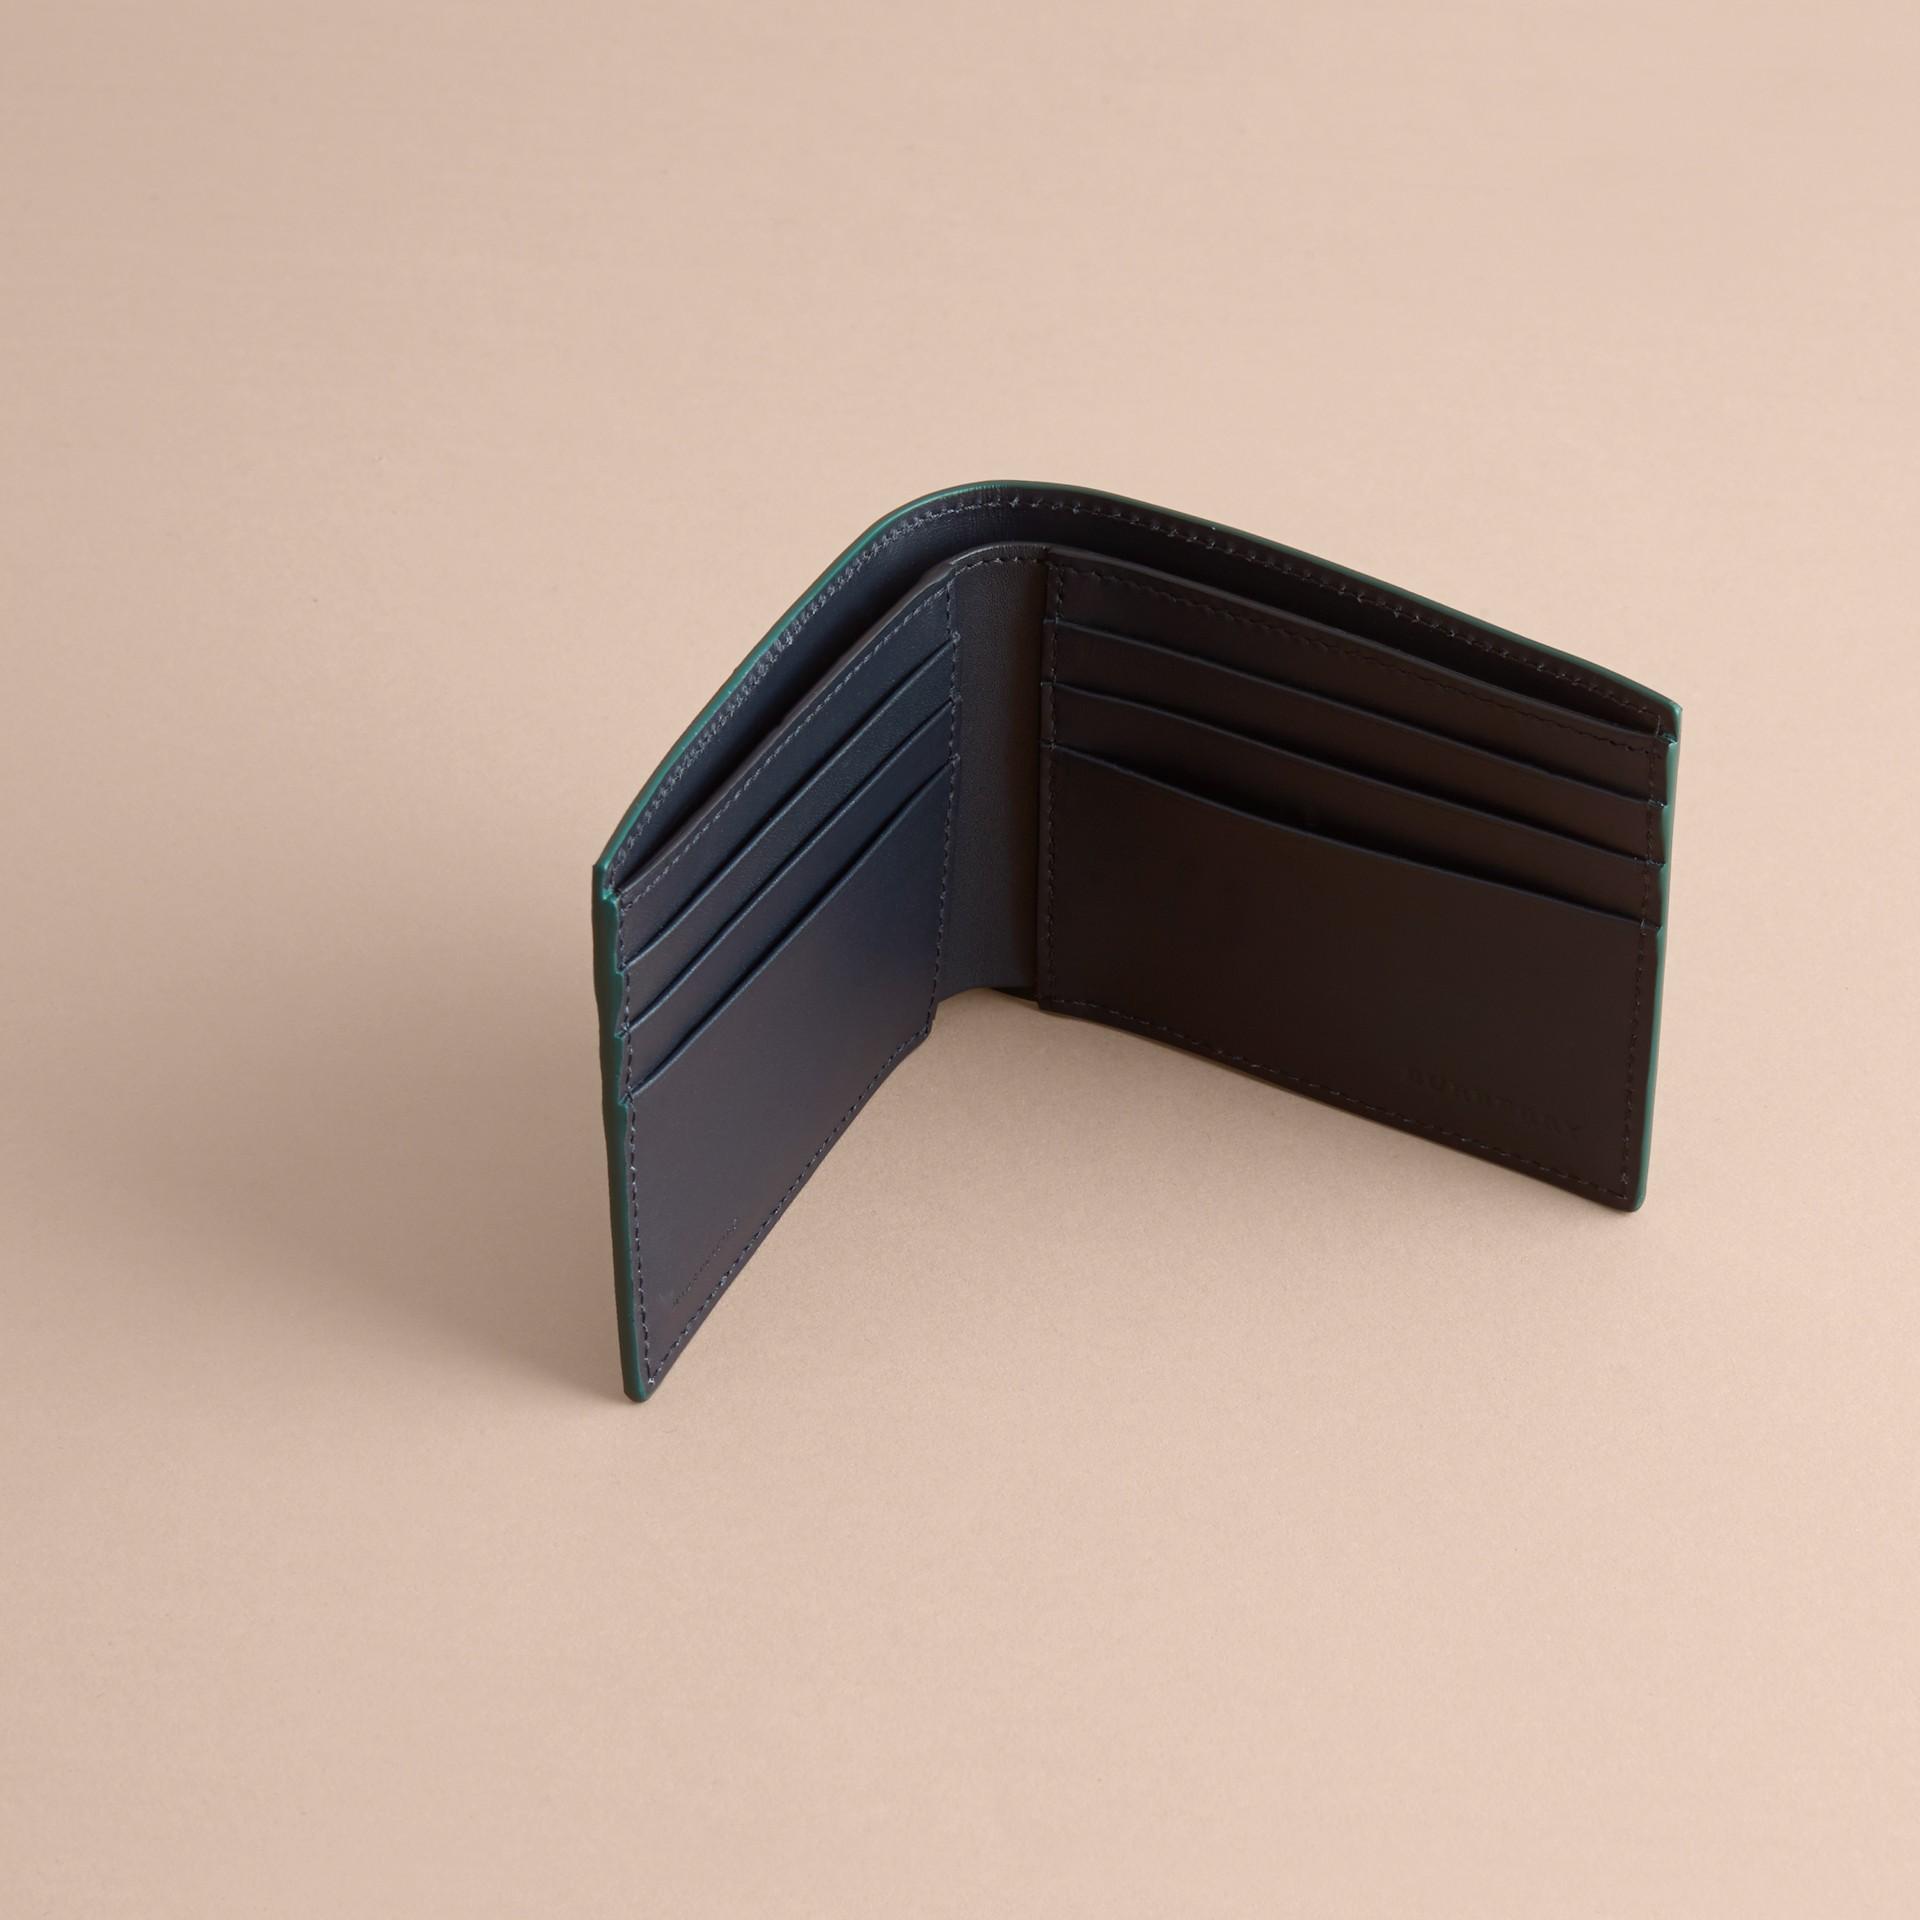 London Leather Bifold Wallet in Dark Teal - gallery image 5